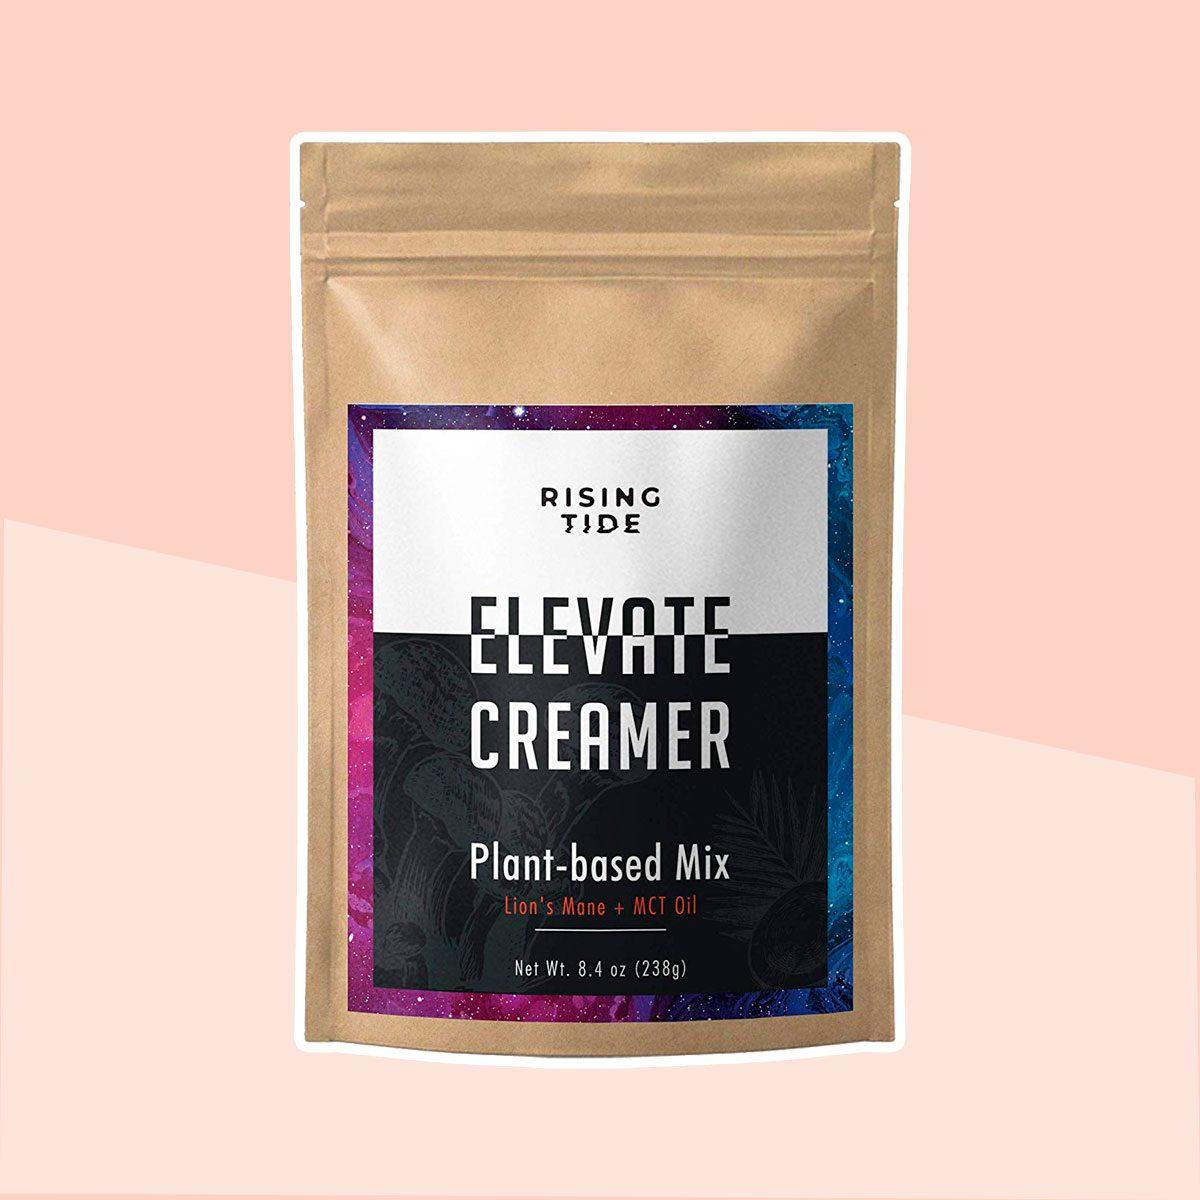 Rising Tide Elevate Creamer